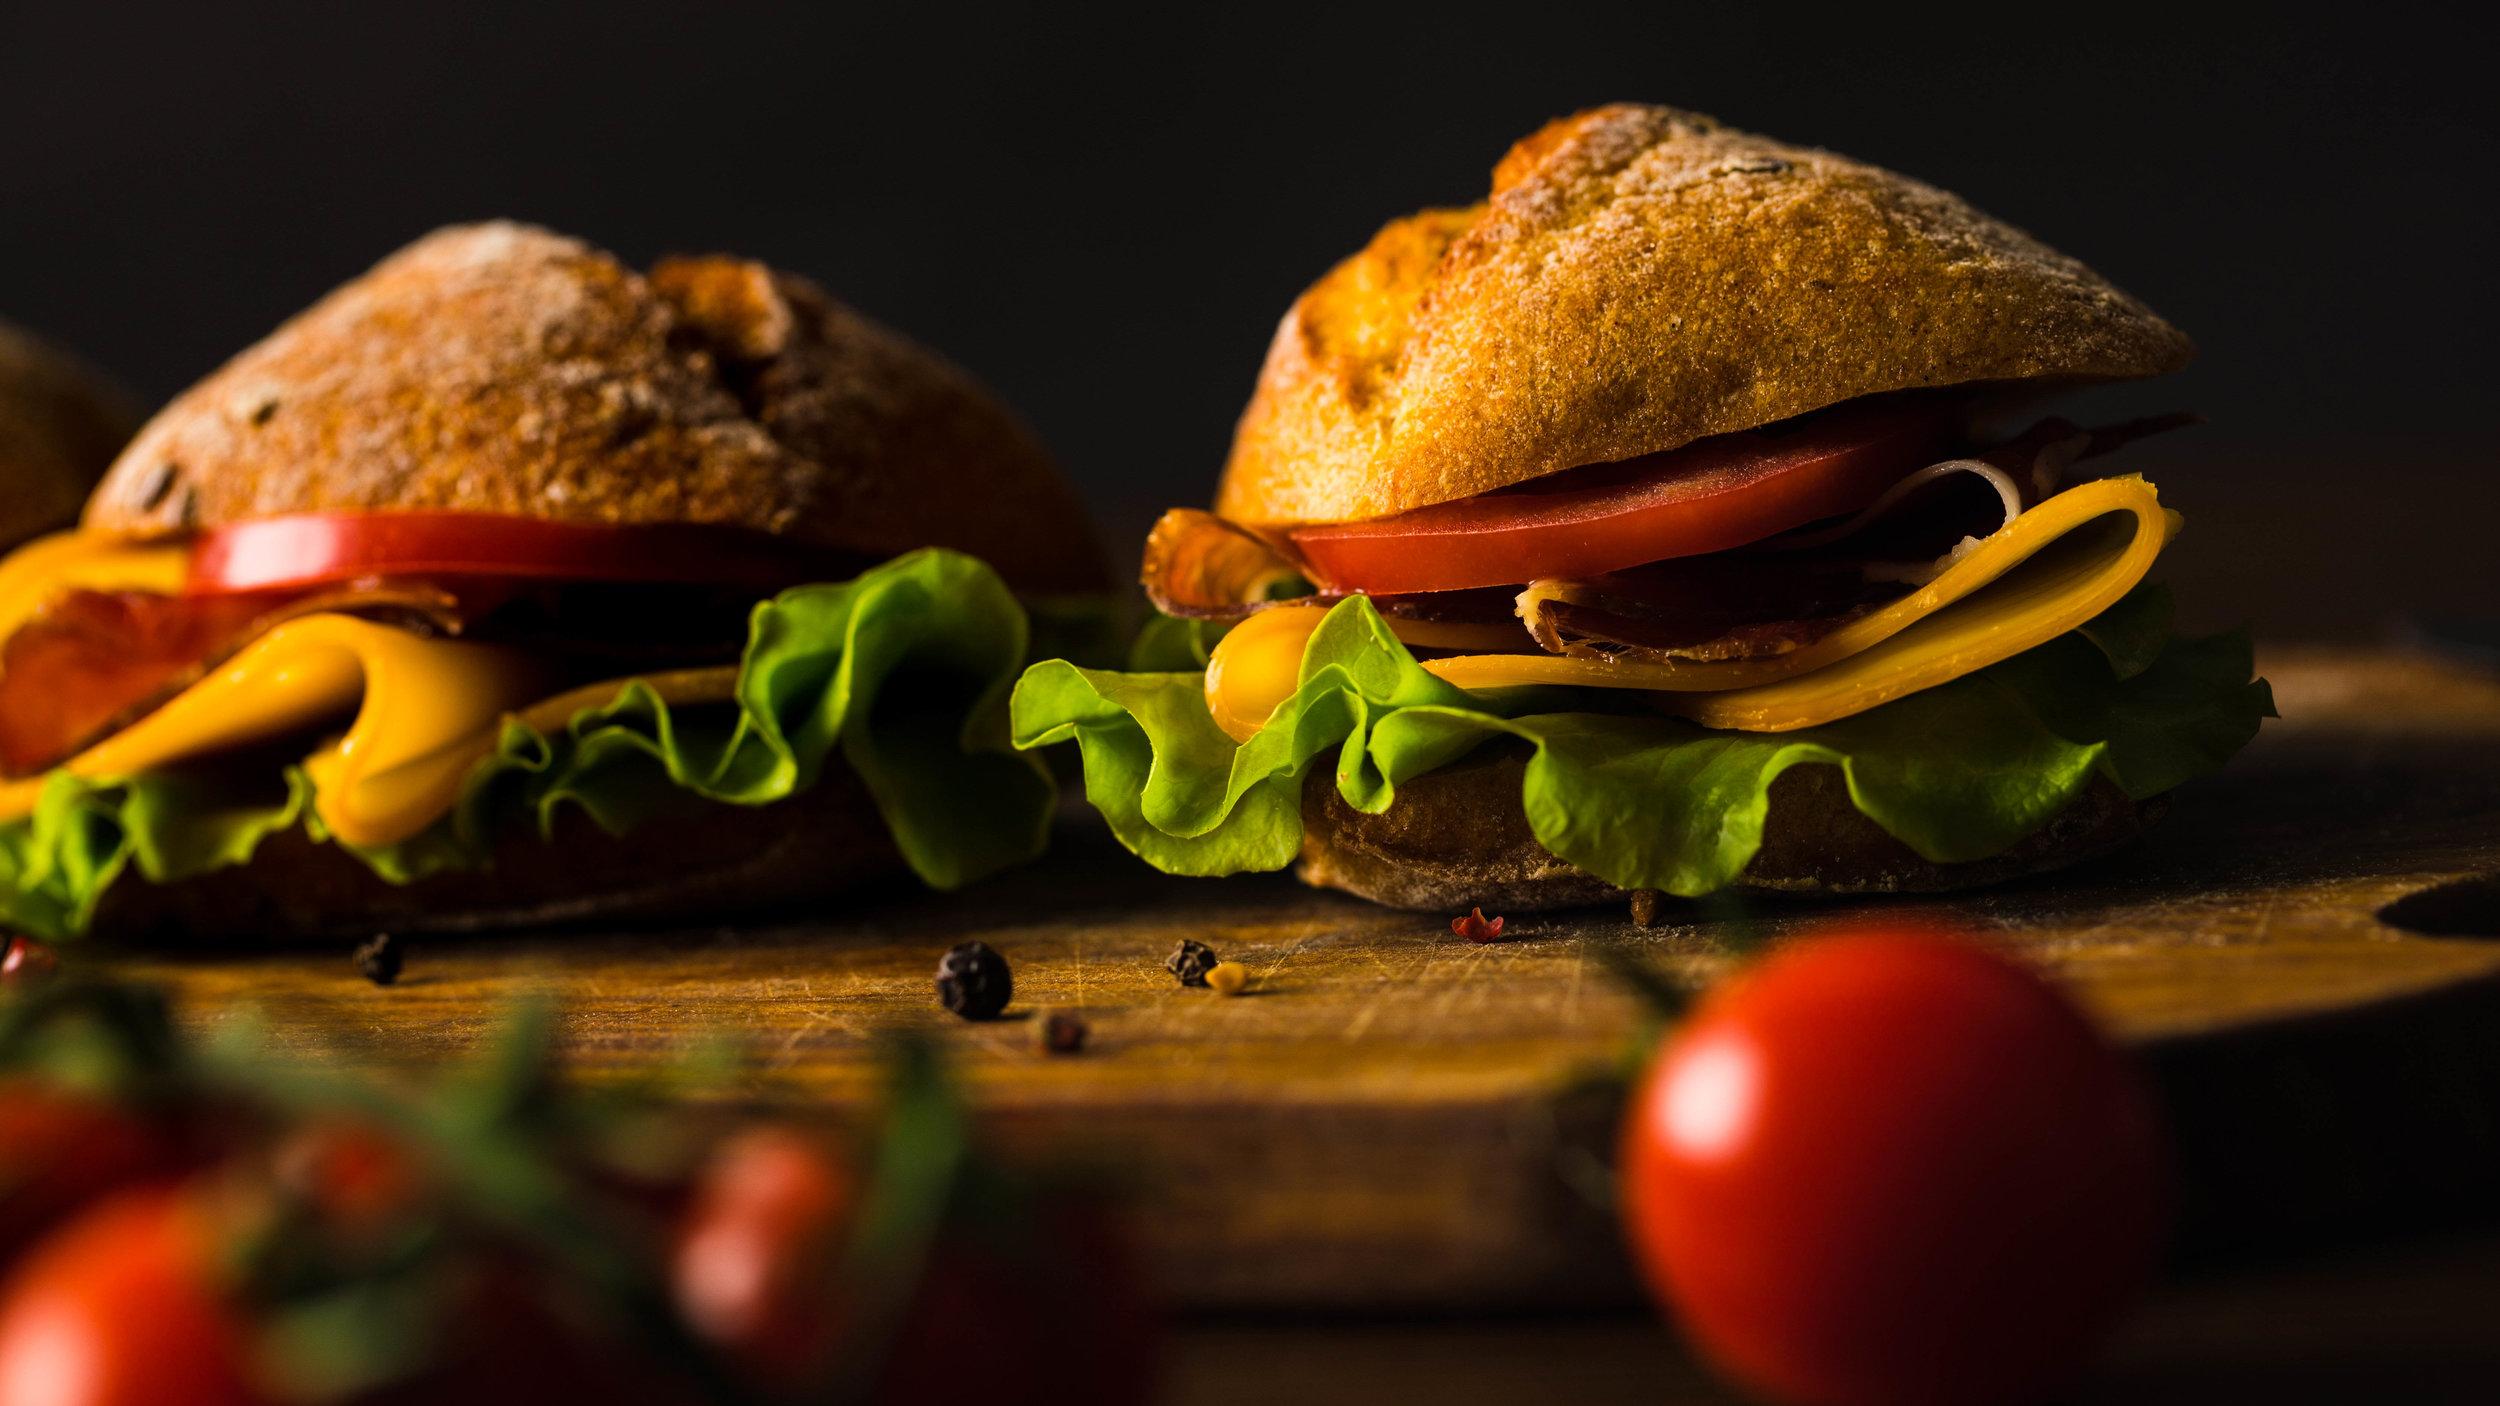 sandwich-1-alr-c169-169.jpg